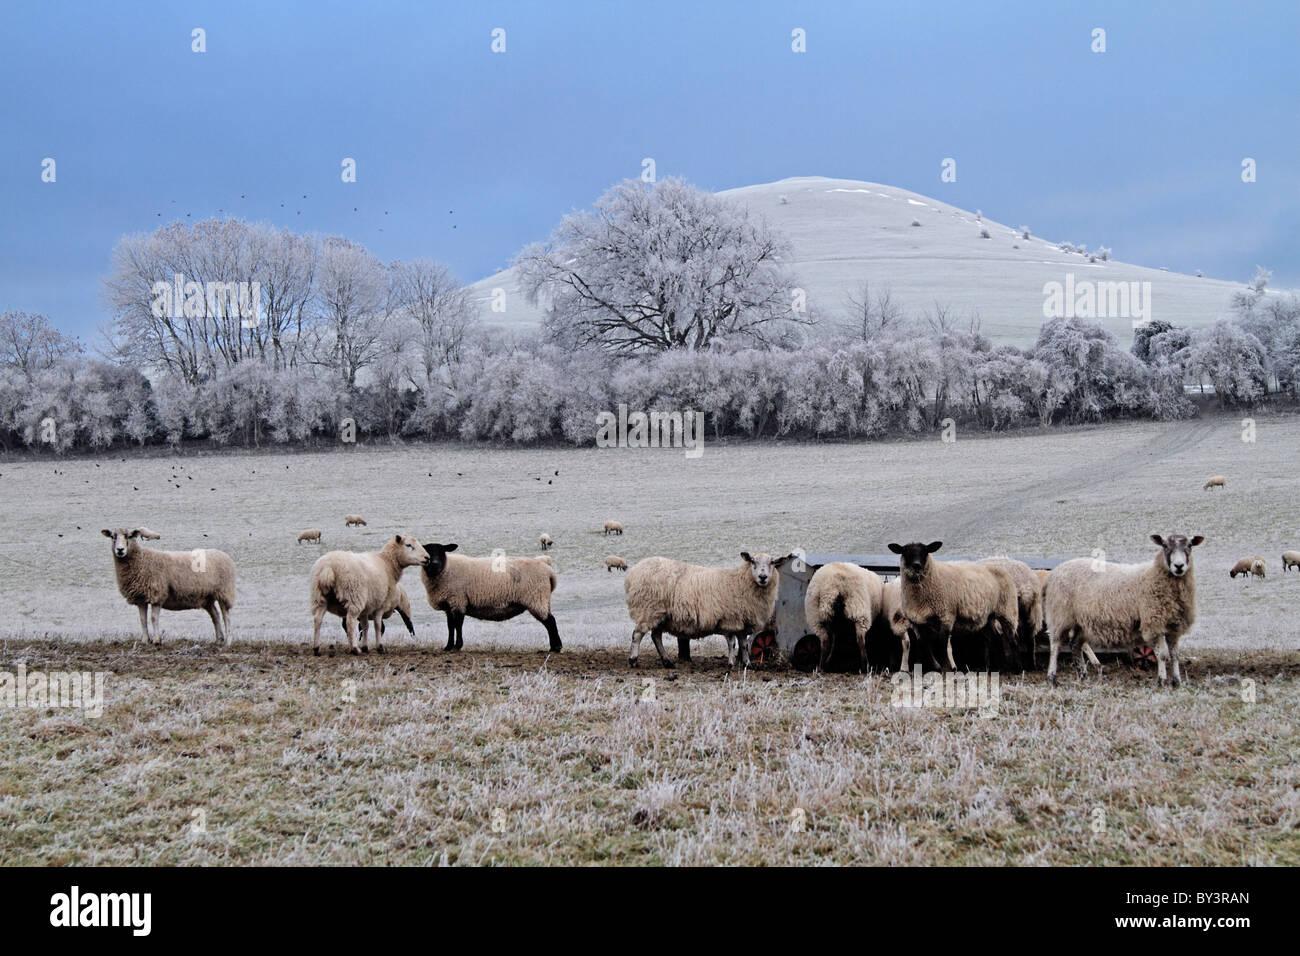 Ovejas en Beacon Hill heladas de invierno gélido hielo hielo Buckinghamshire Chilterns agricultura Bucks Imagen De Stock